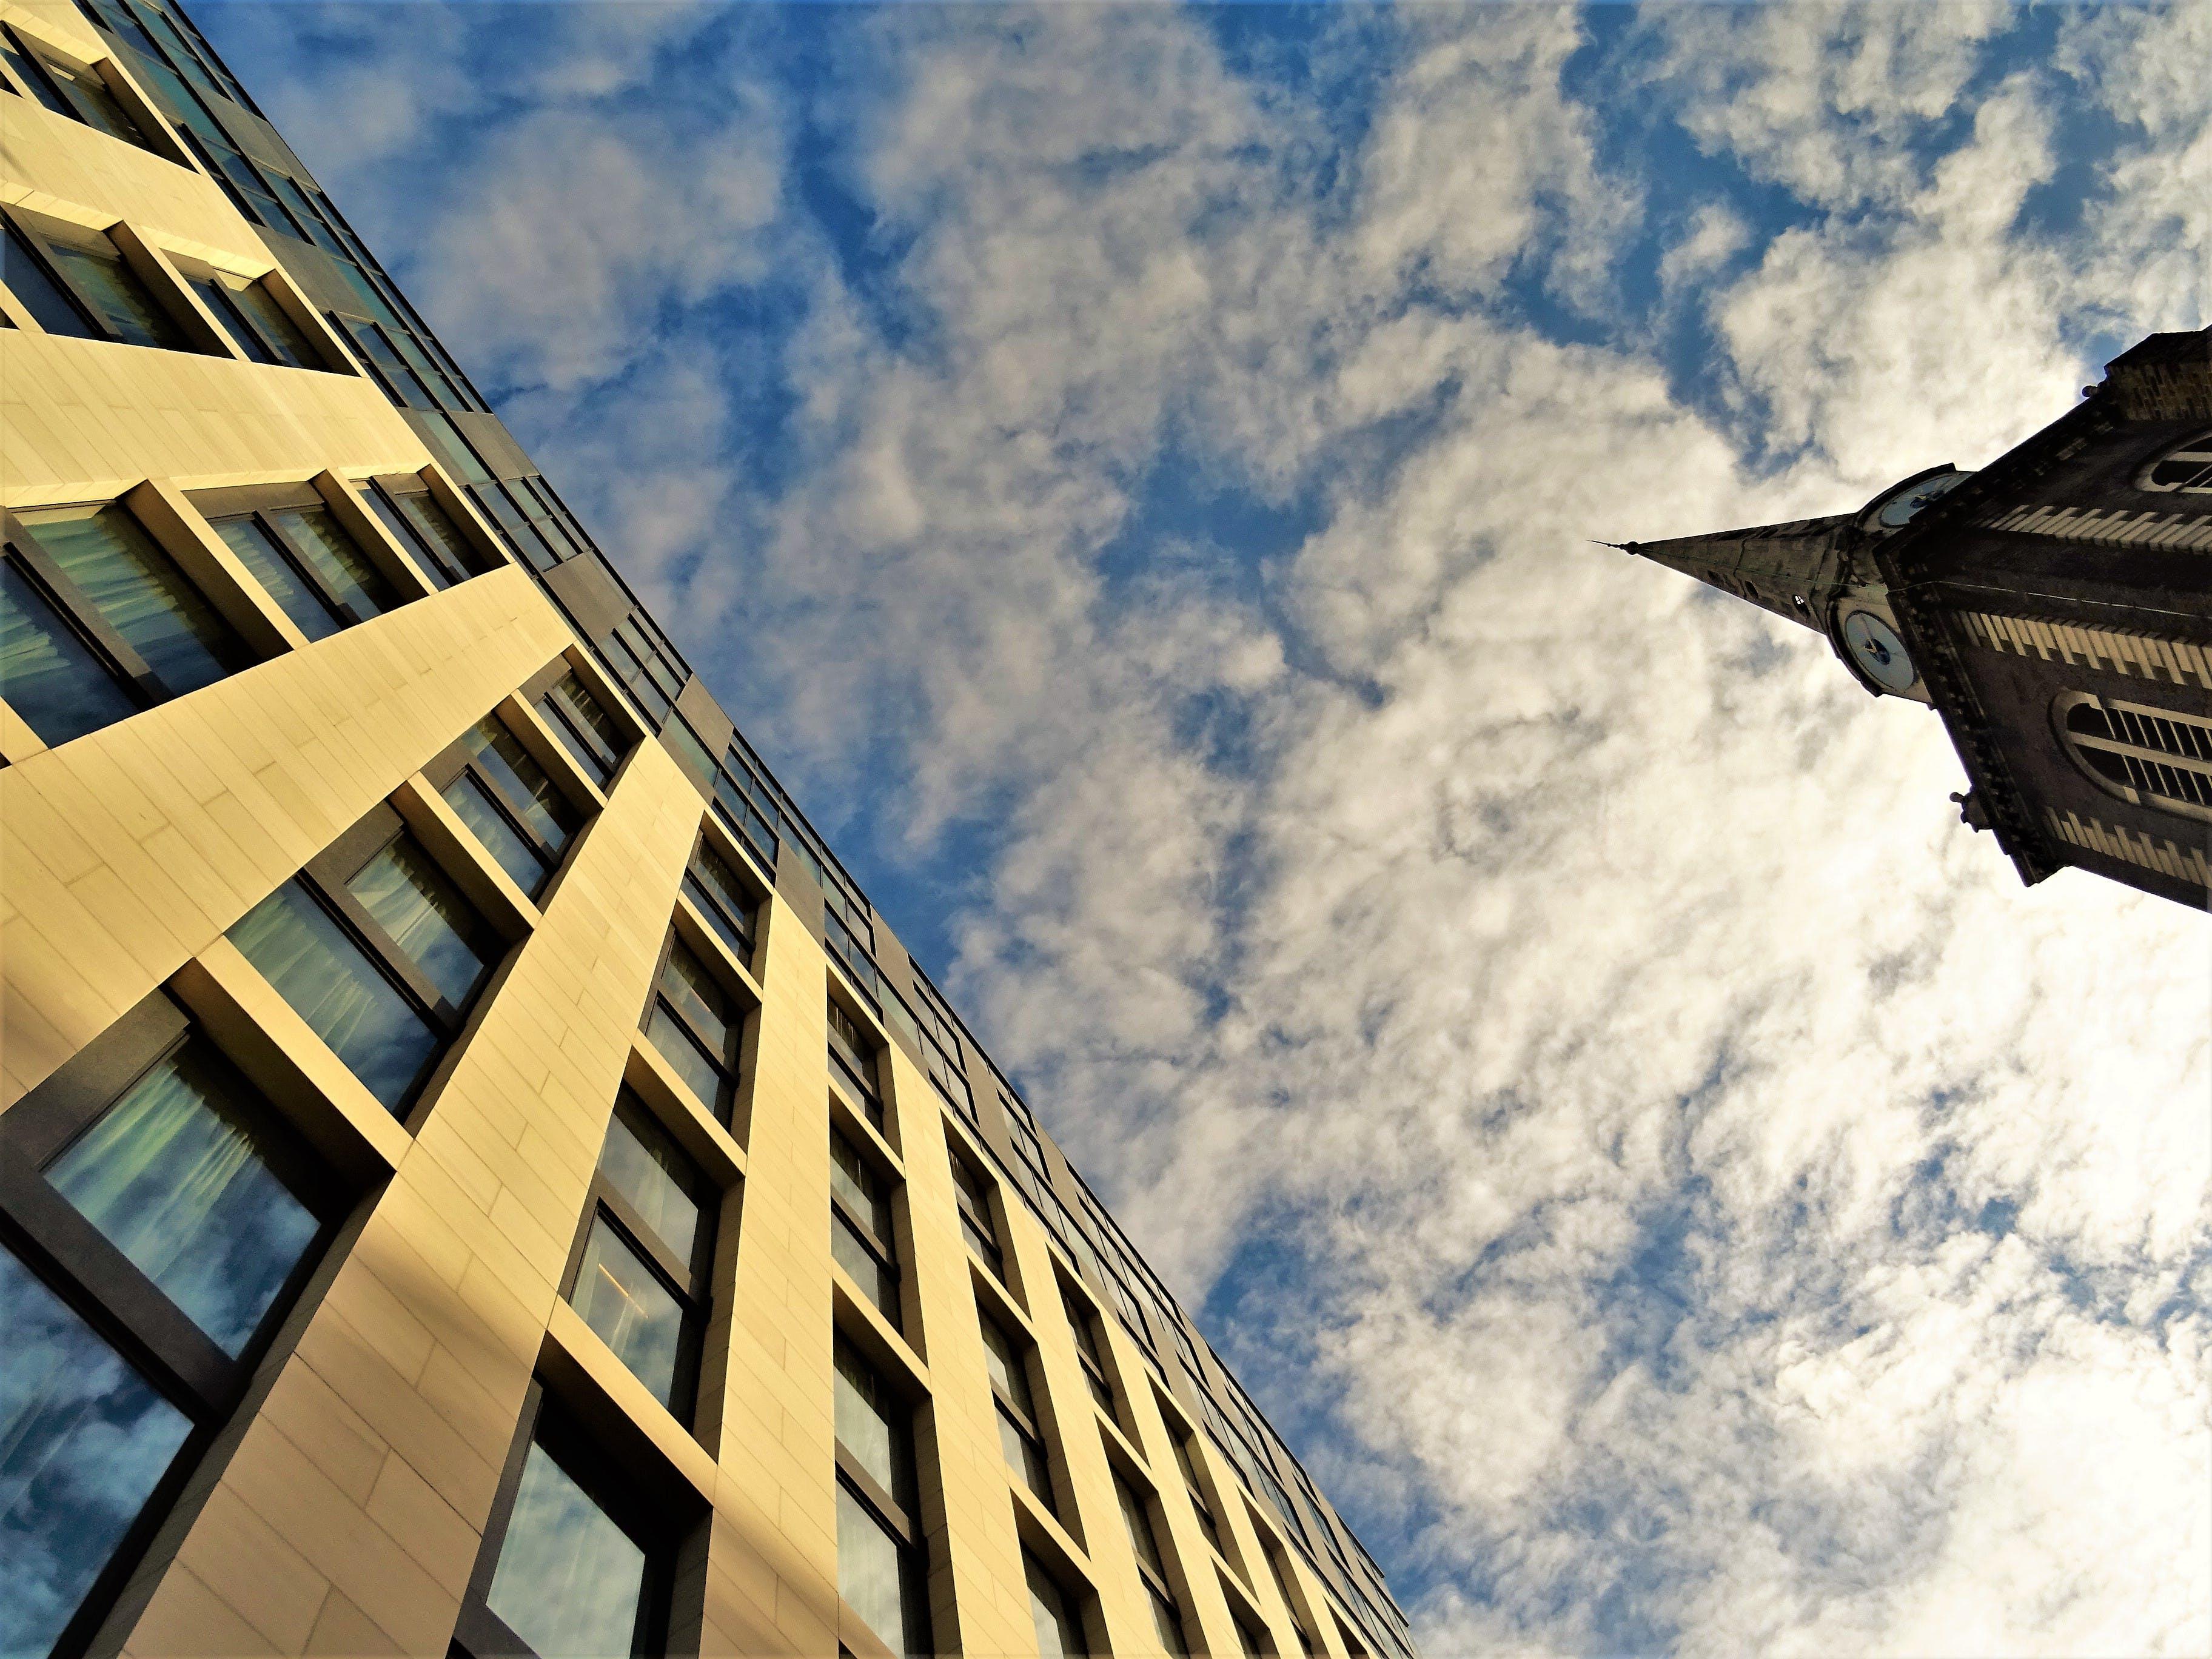 de alto, arquitectura, céntrico, cielo